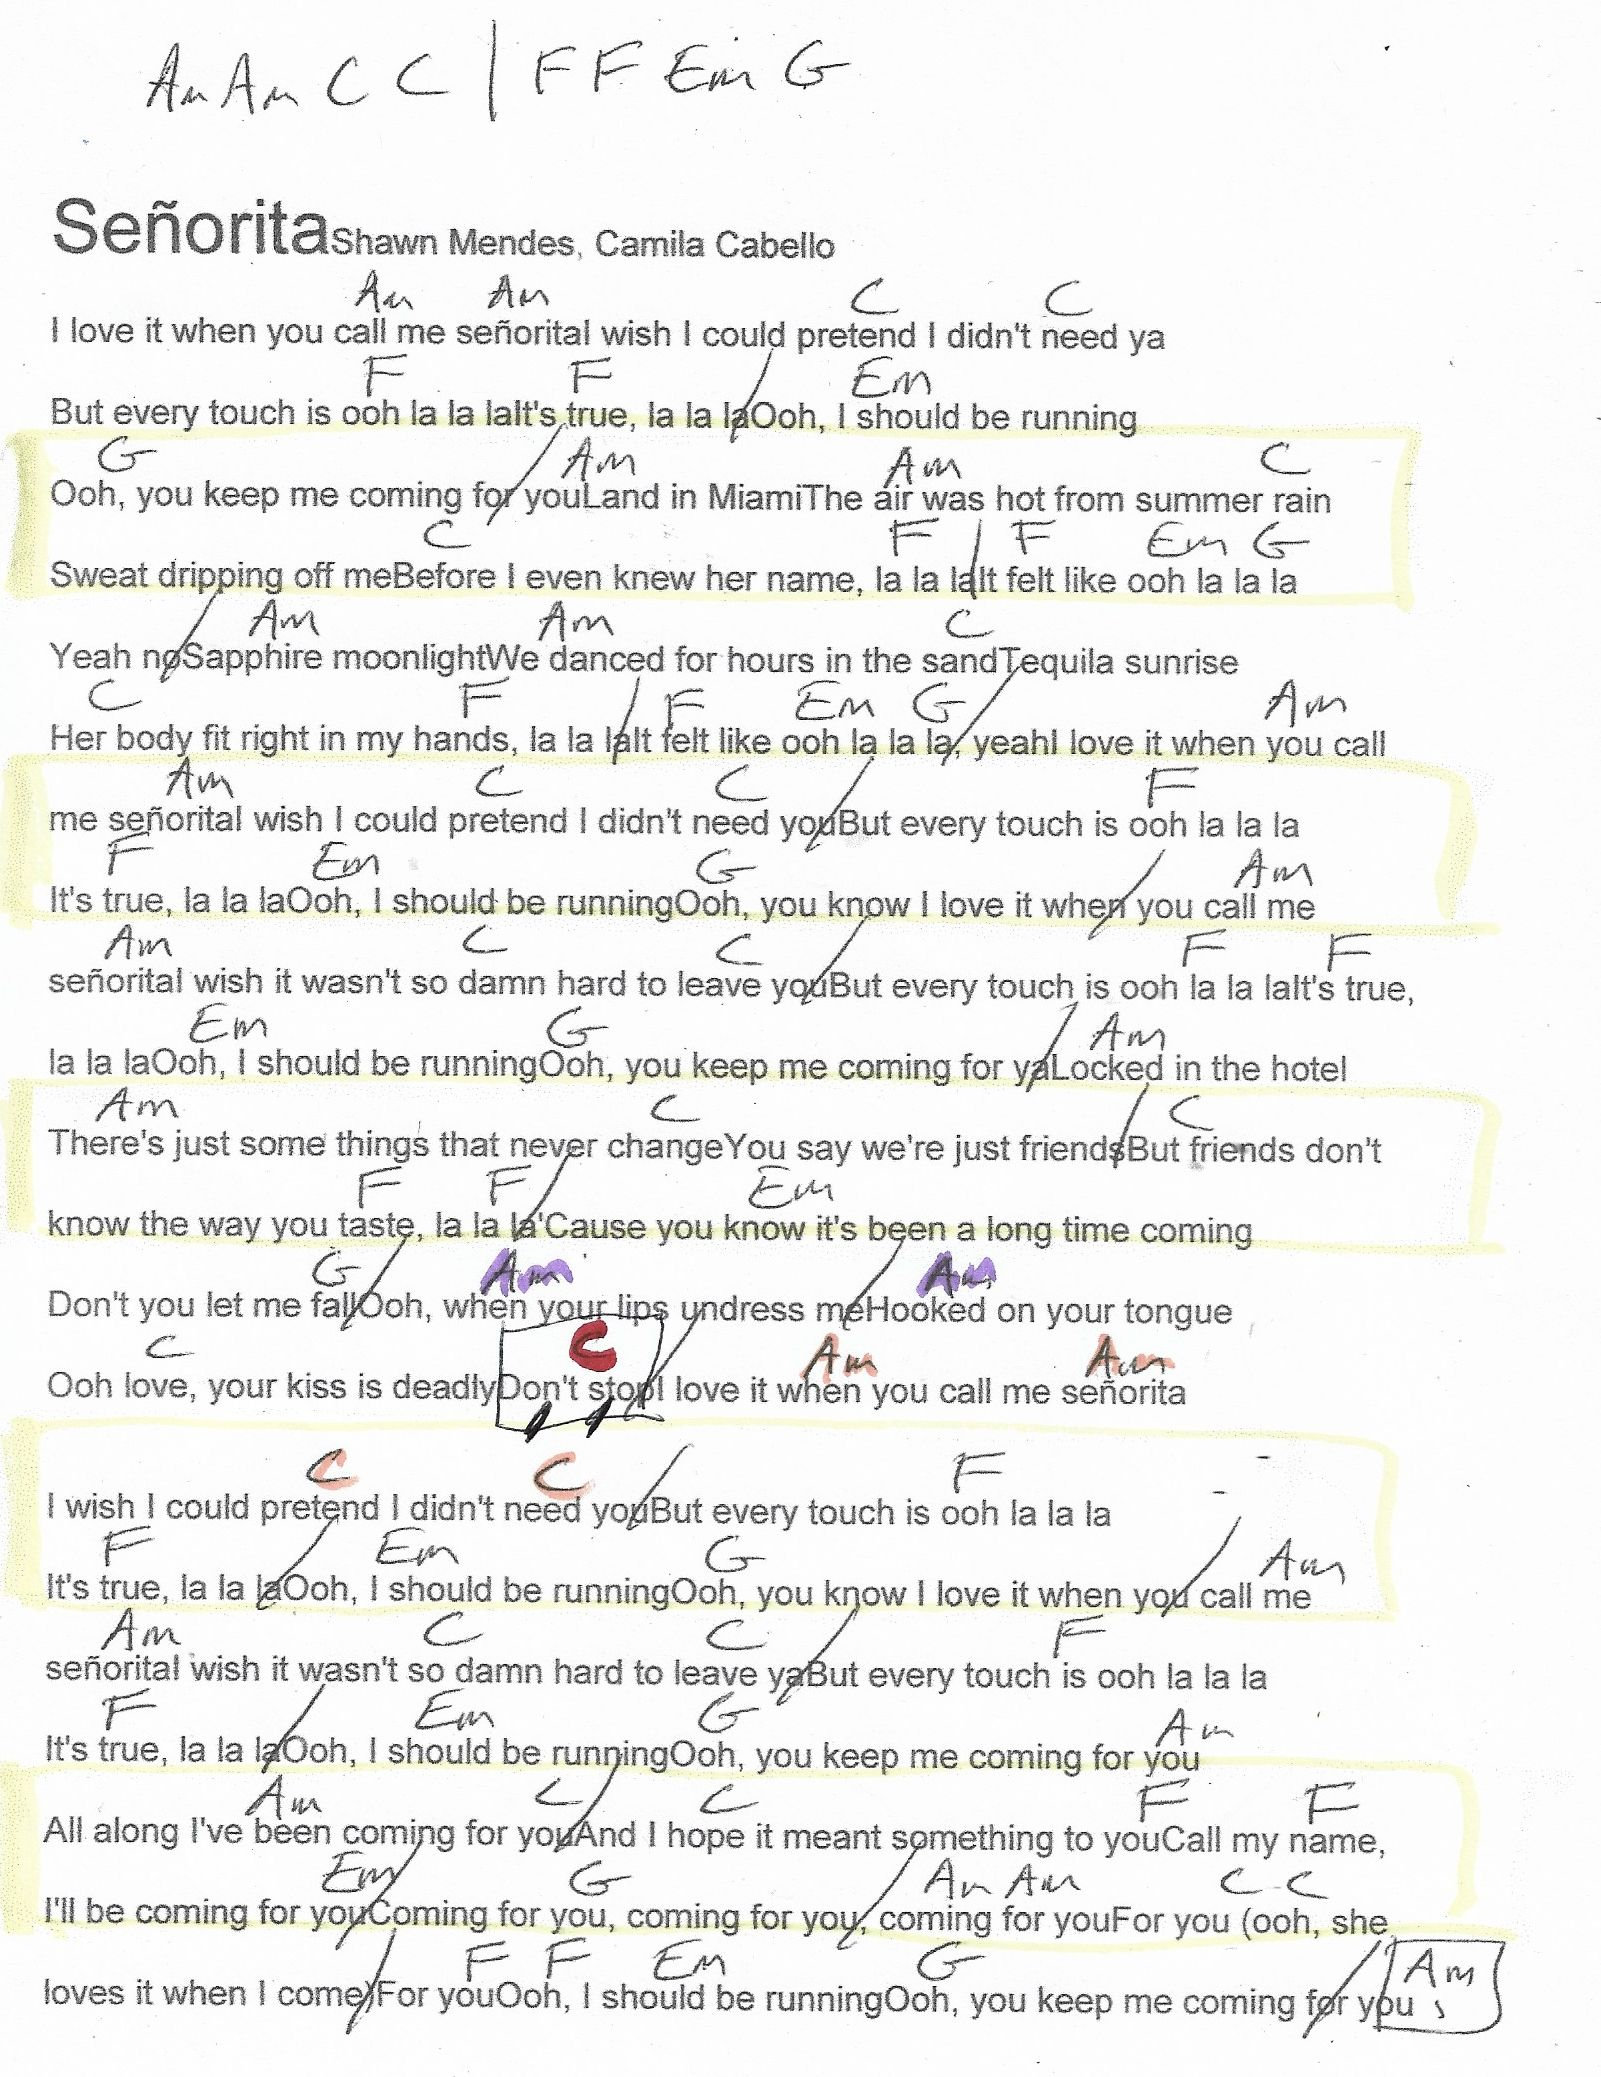 Kunci Gitar Senorita : kunci, gitar, senorita, Senorita, (Shawn, Mendes), Guitar, Chord, Chart, Marked, Chords, Lyrics,, Ukulele, Songs,, Shawn, Mendes